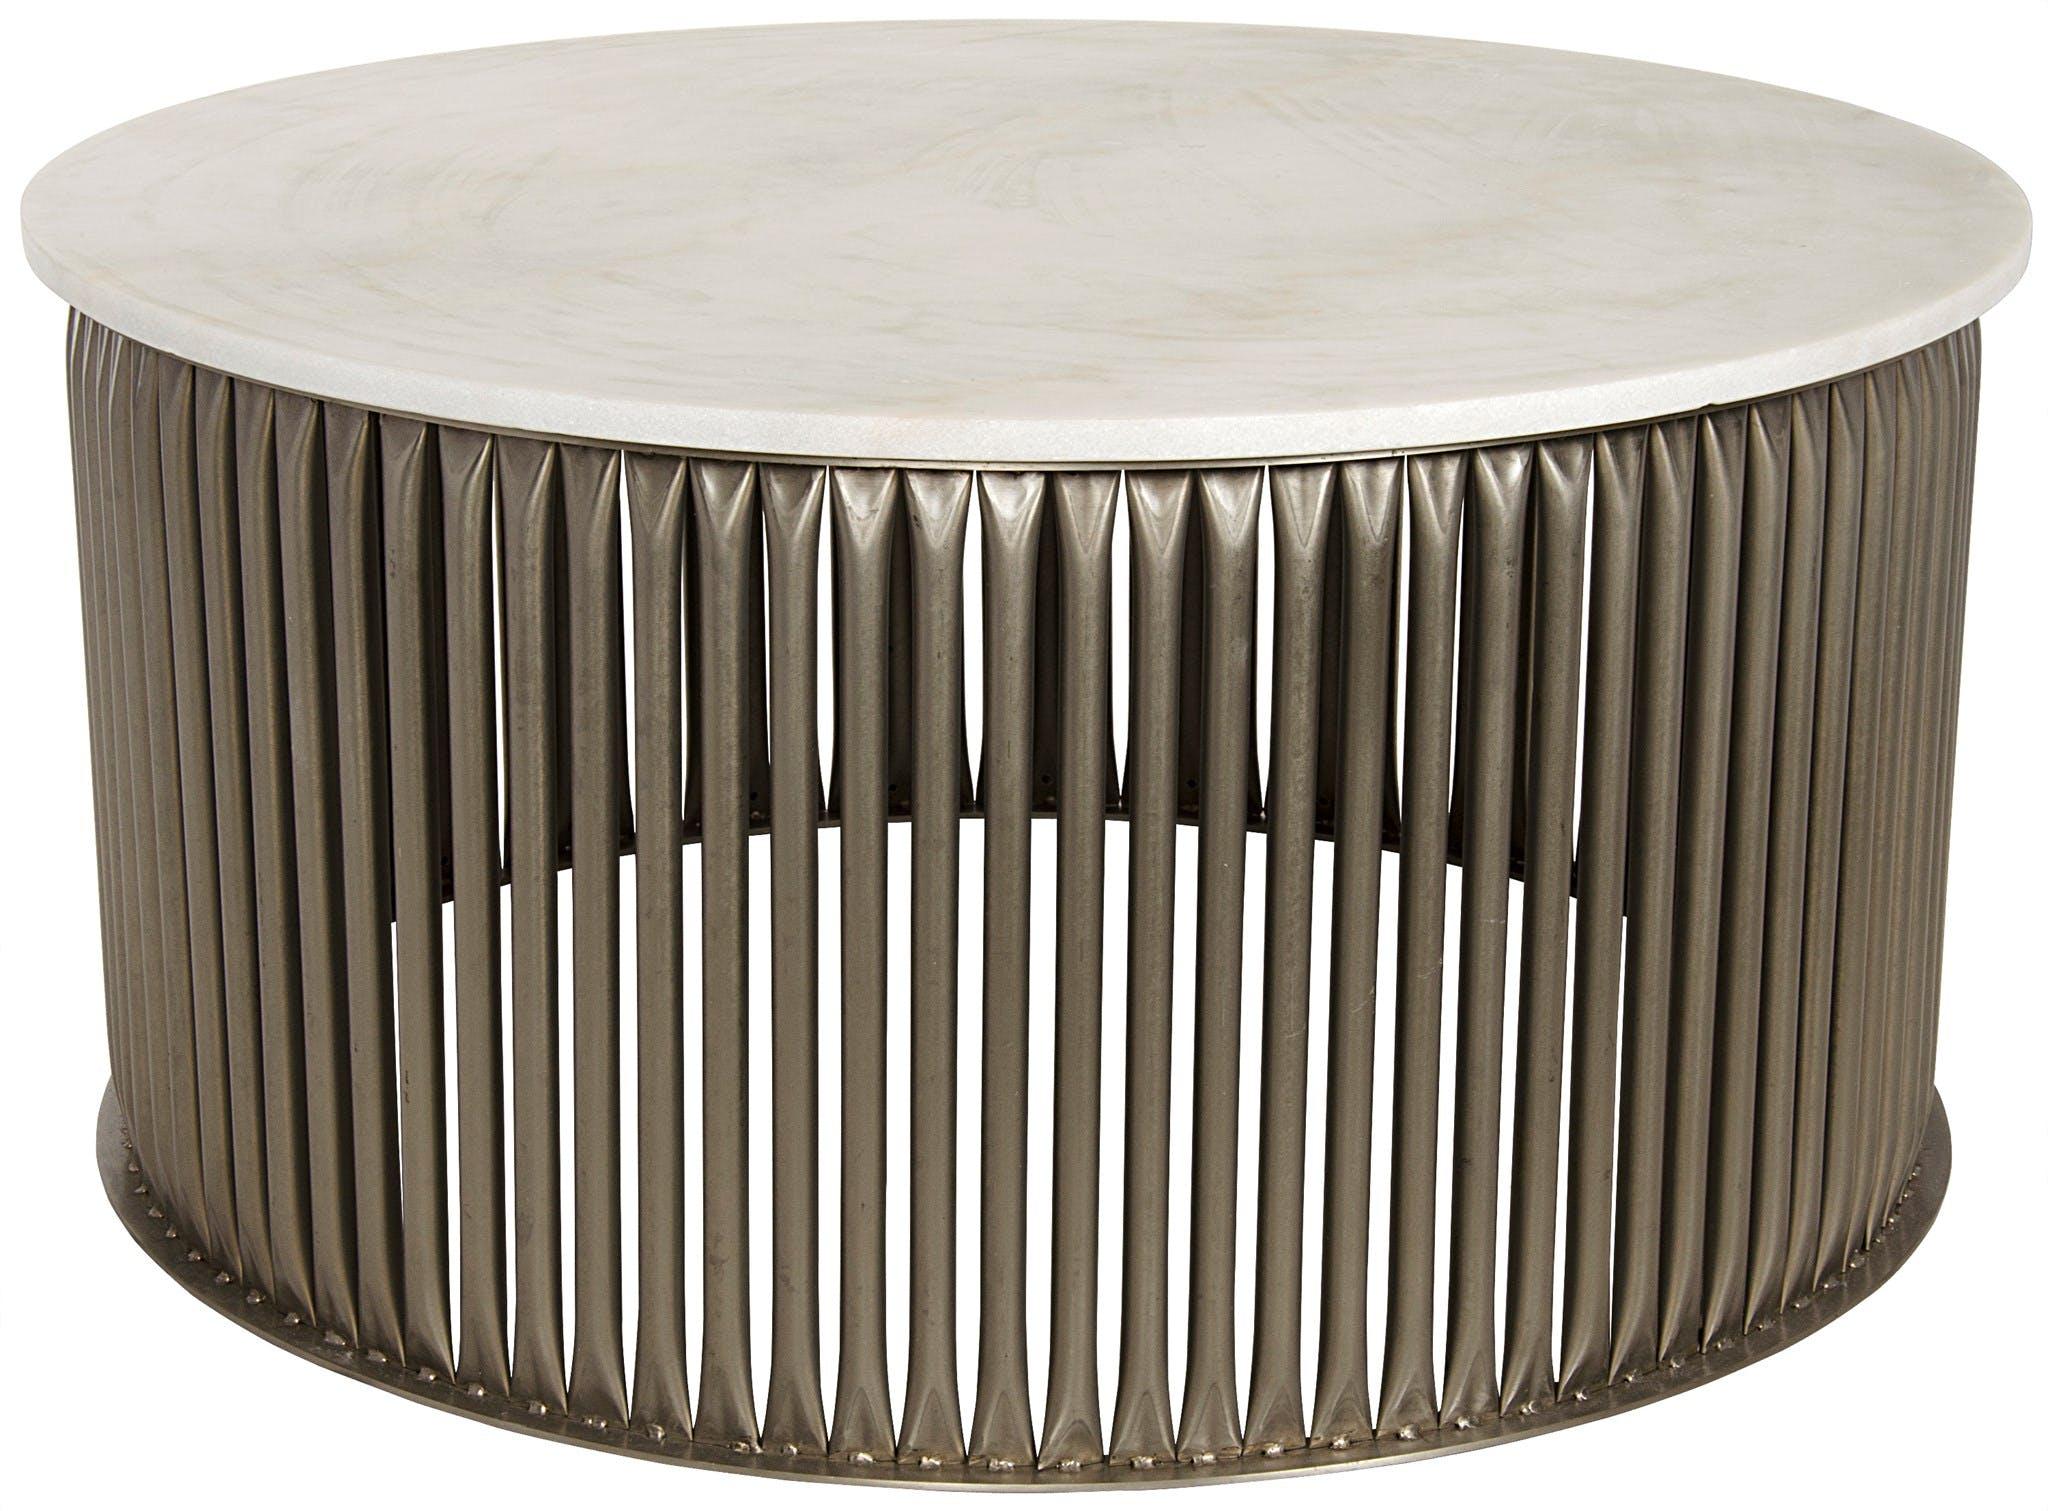 Noir Lenox Coffee Table Antique Silver Metal And Stone Gtab1008asv Portland Or Key Home